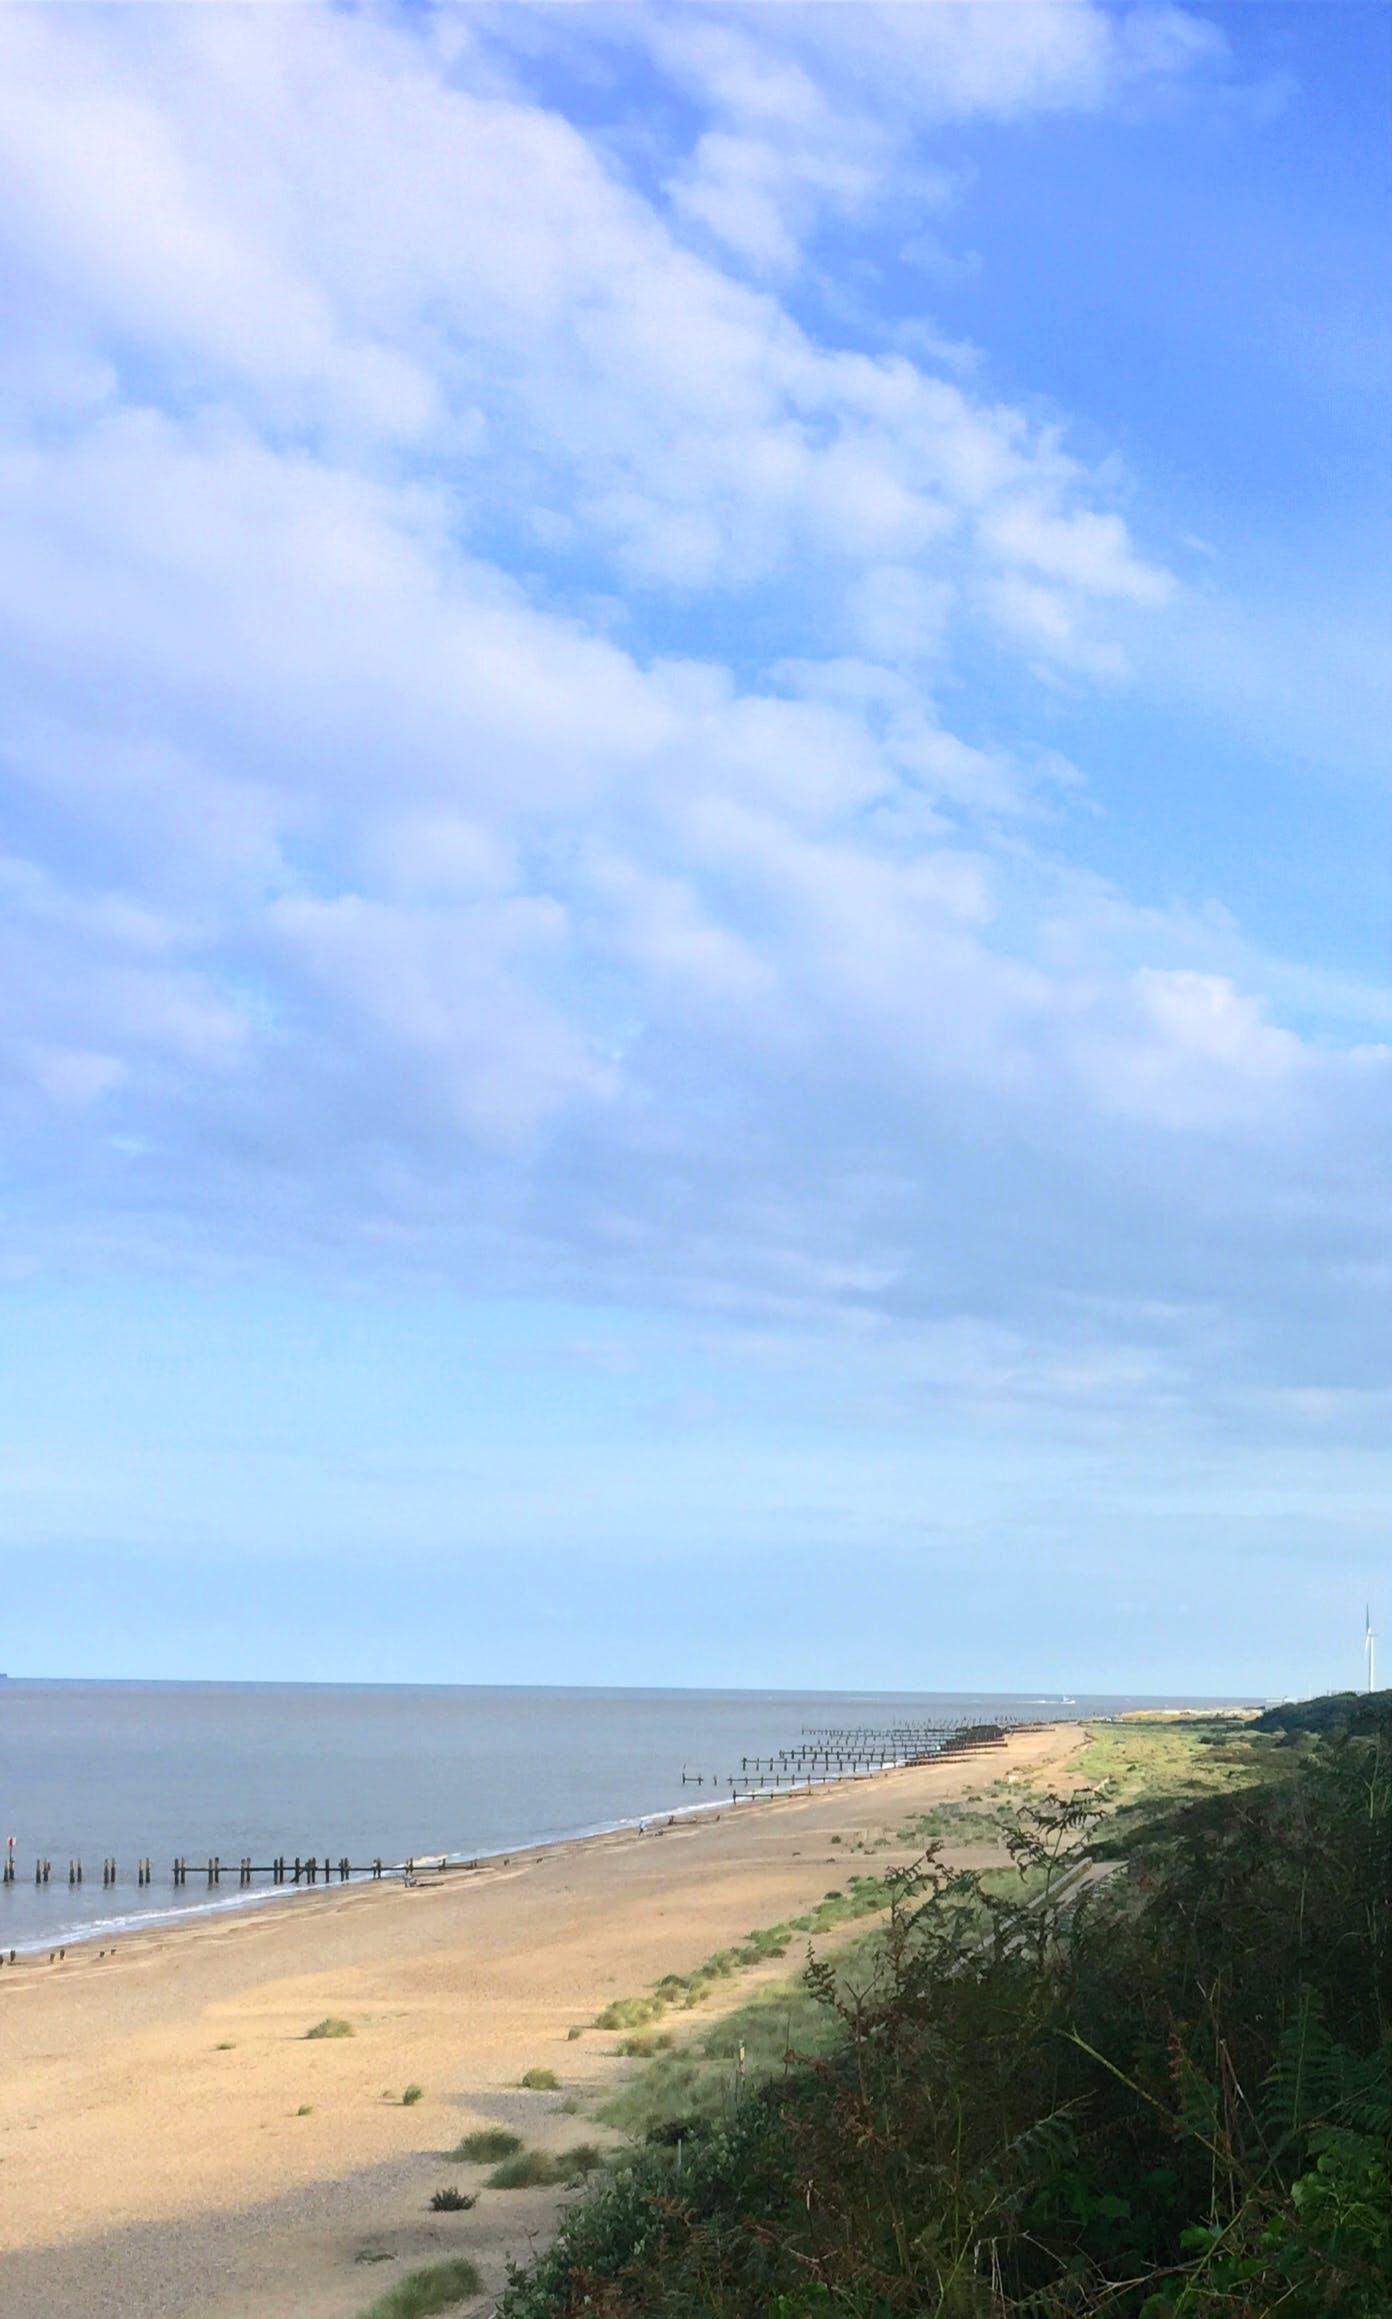 Free stock photo of beach, cliff, cliffside, coast